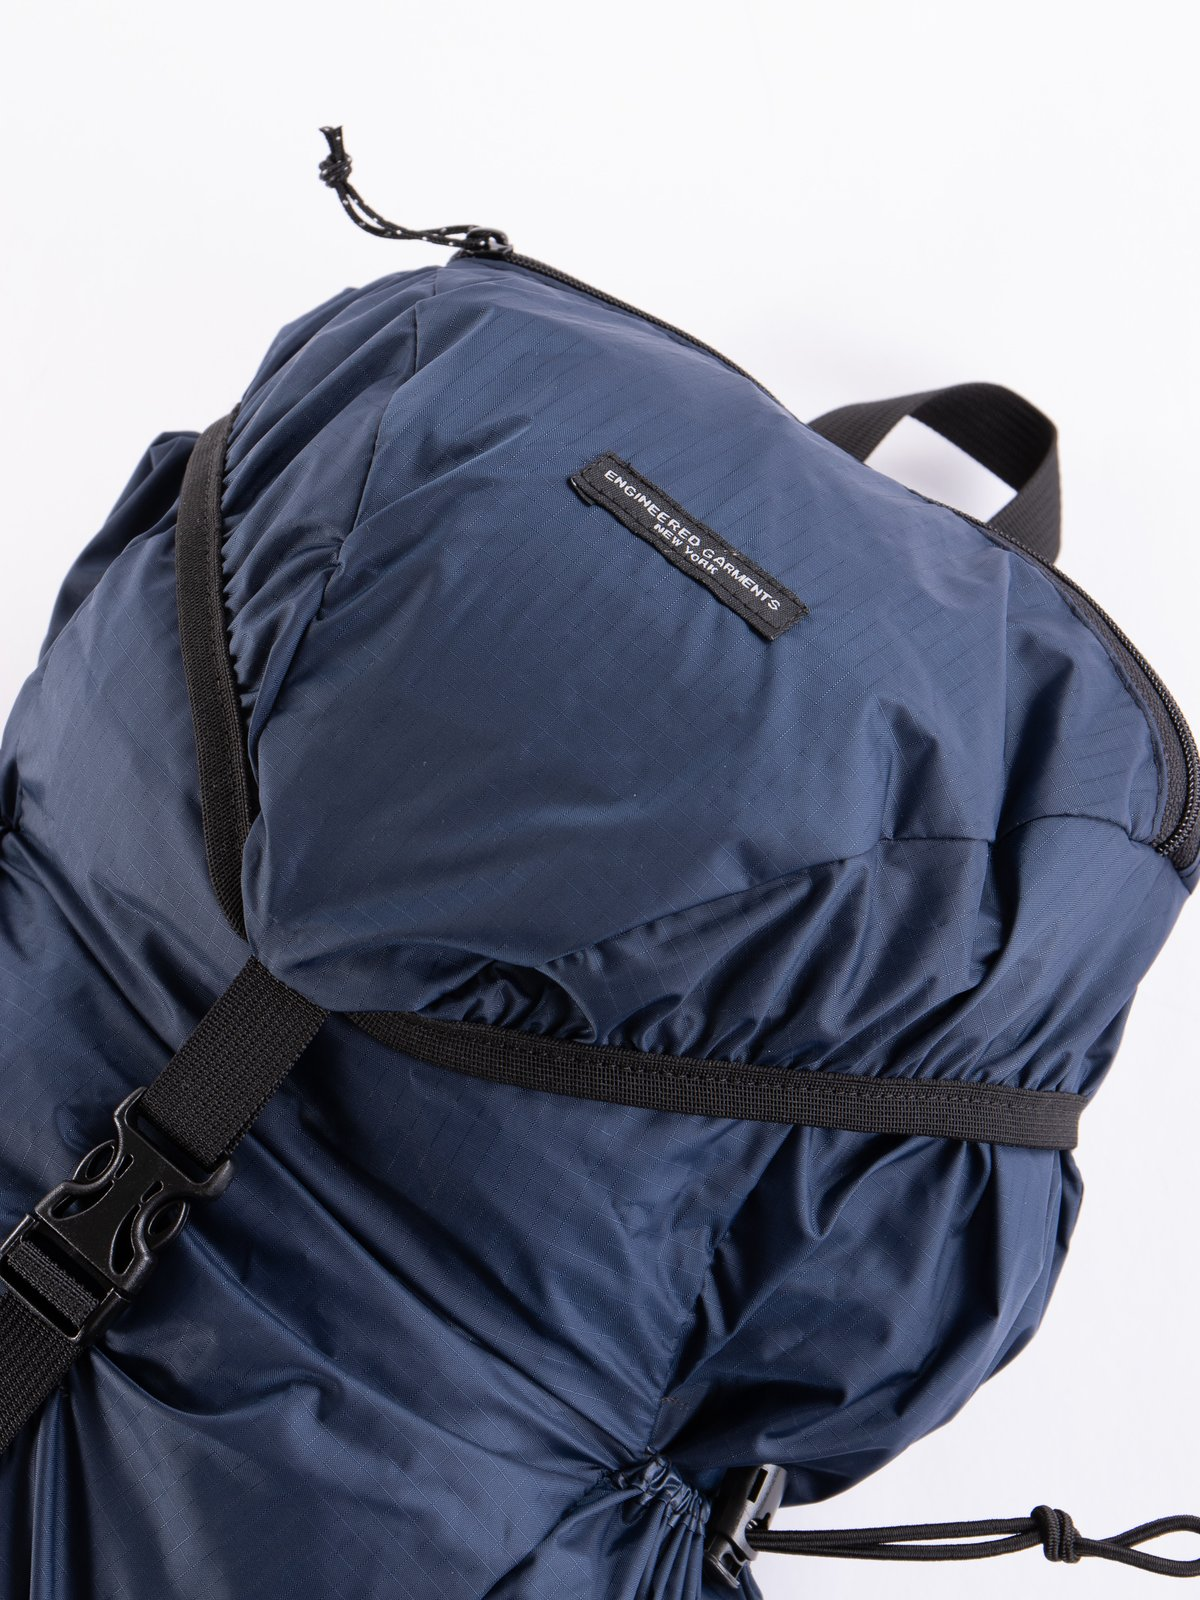 Navy Nylon Ripstop UL Backpack - Image 2